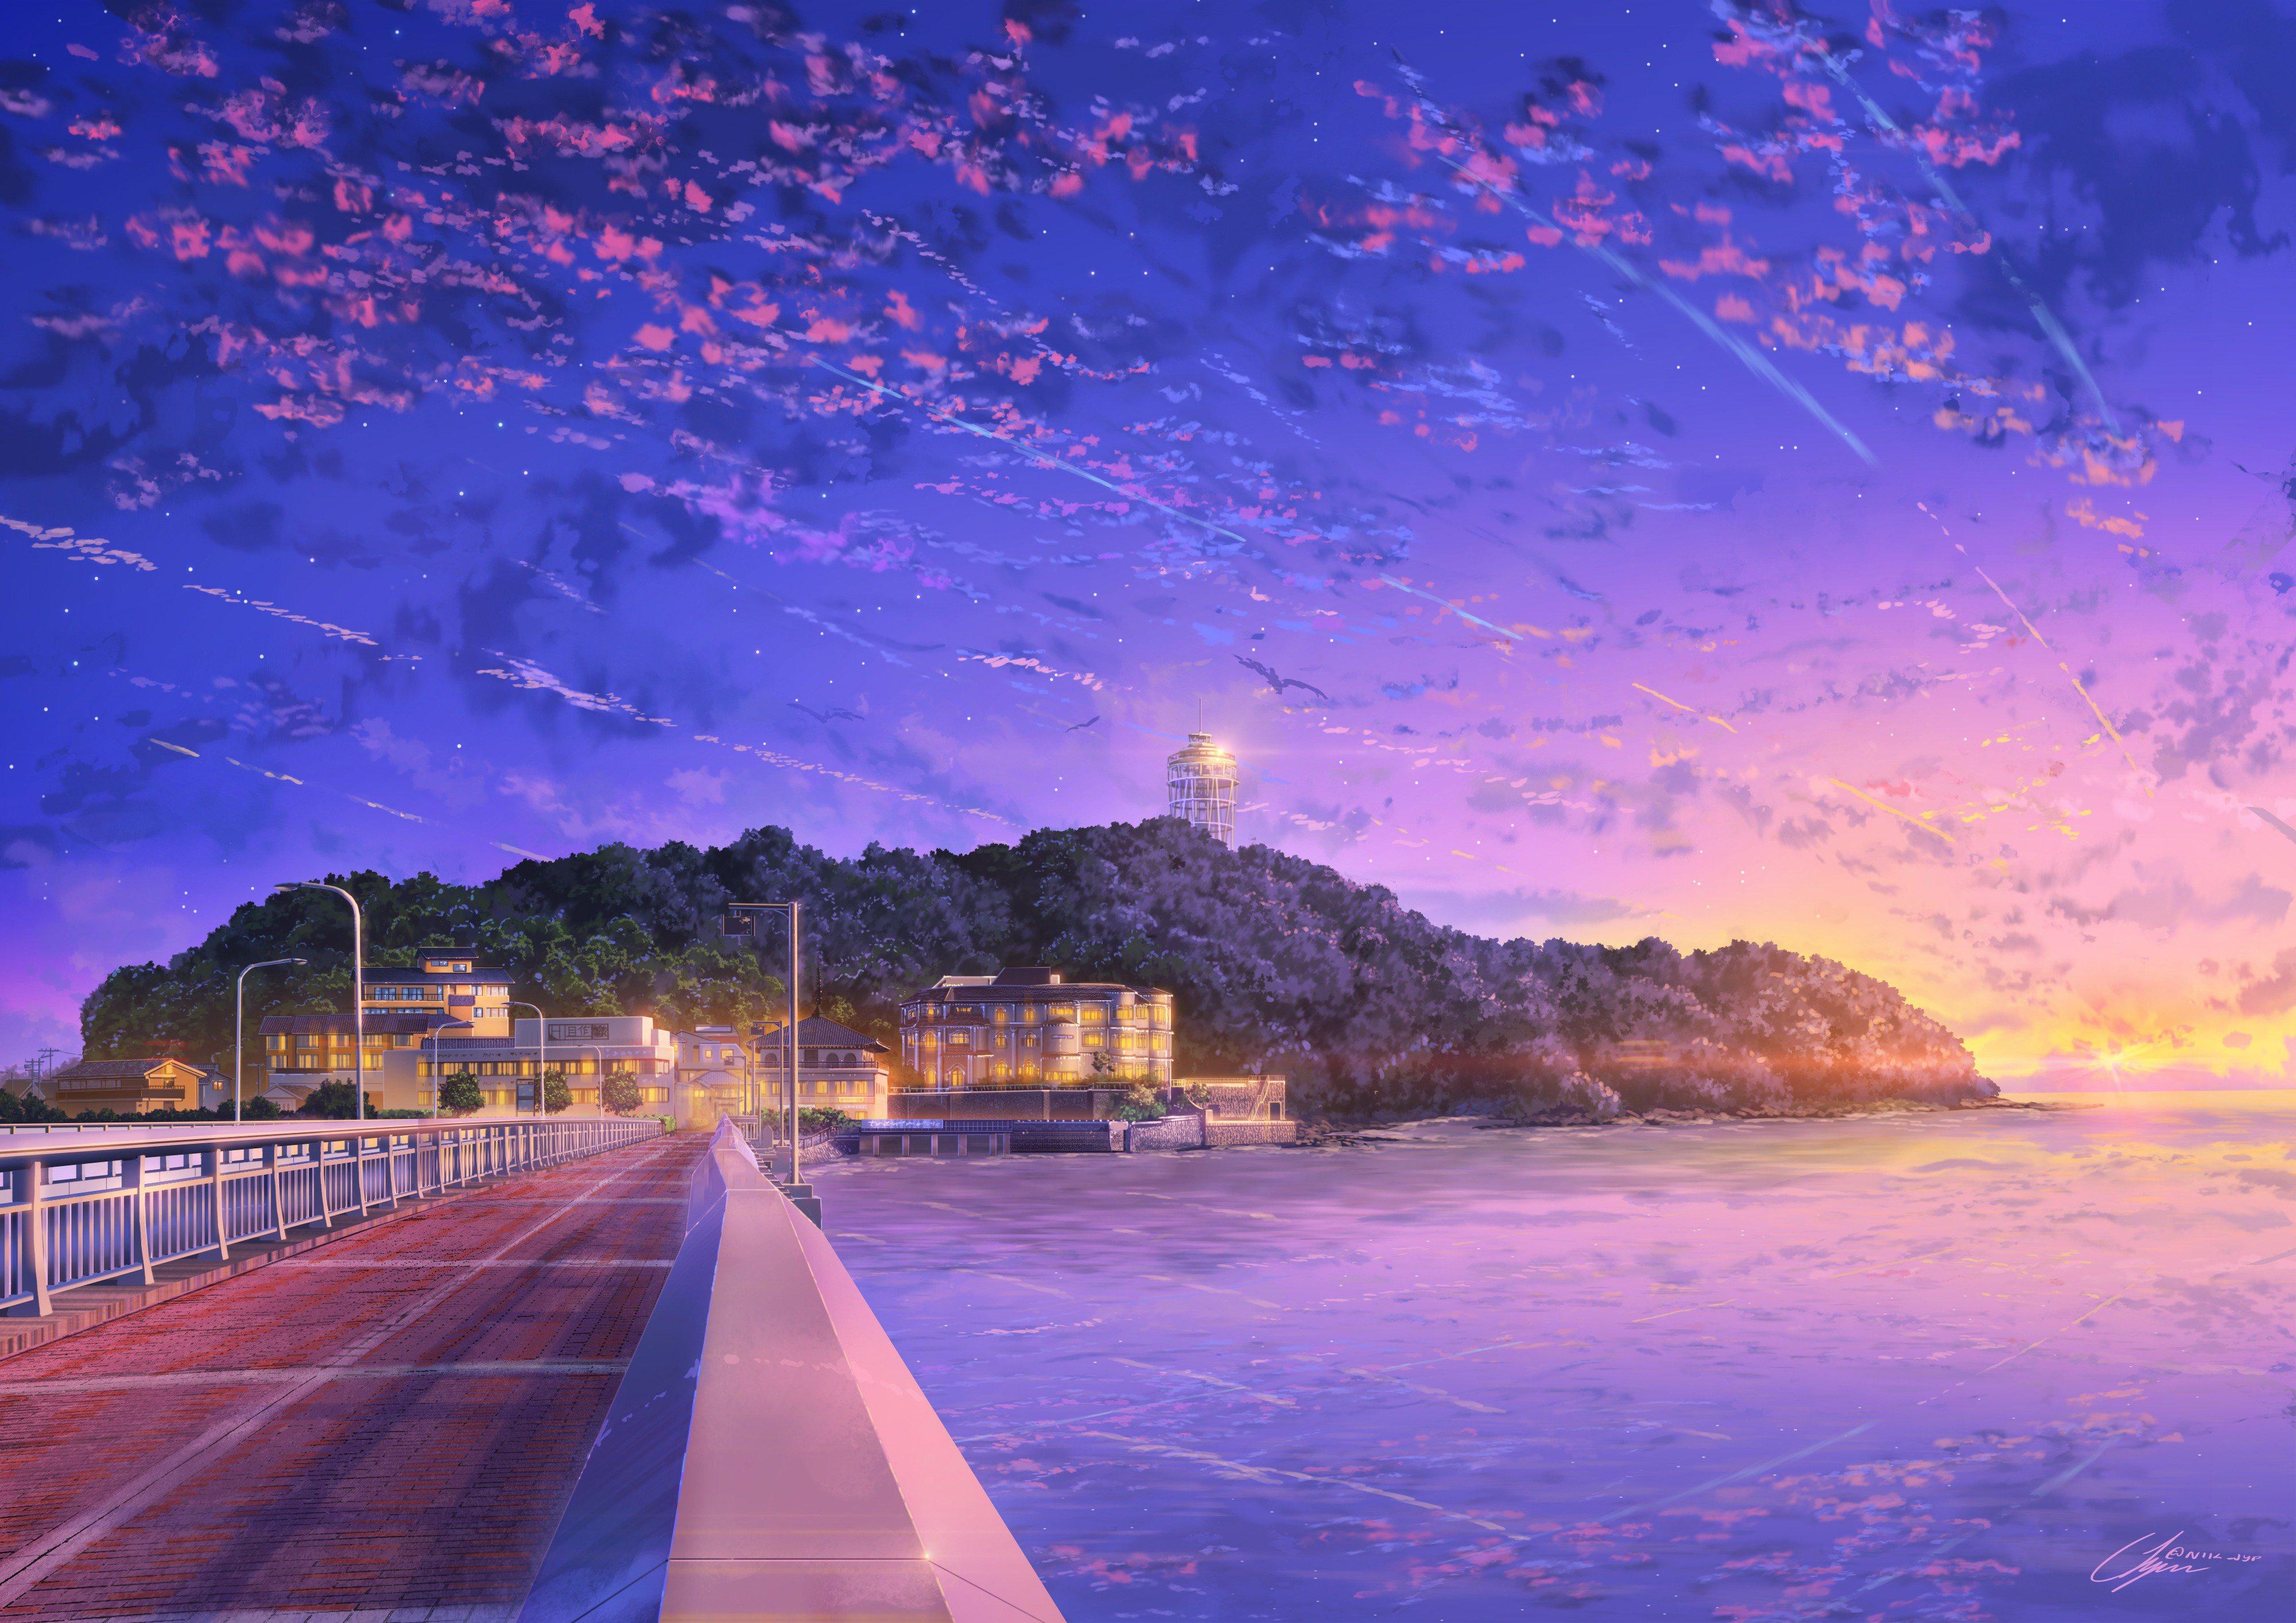 Anime 4000x2828 anime sky Asia water outdoors Japan enoshima